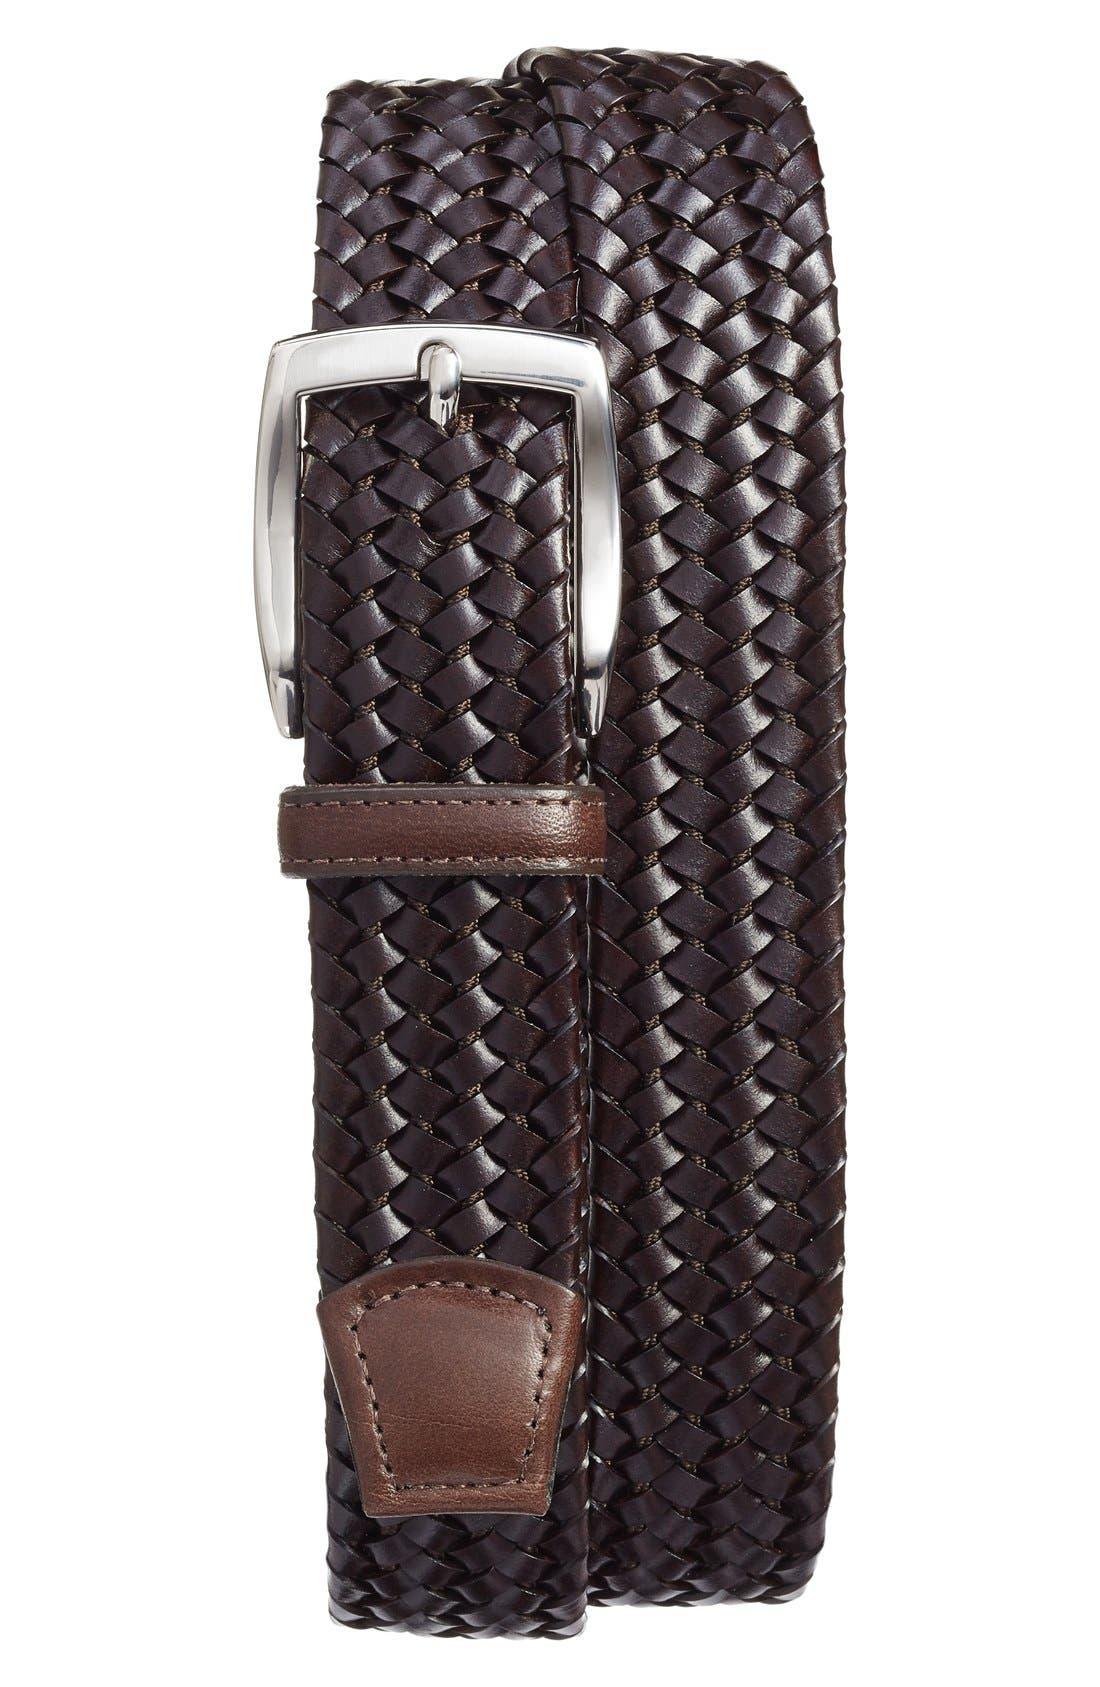 Torino Belts Woven Leather Belt